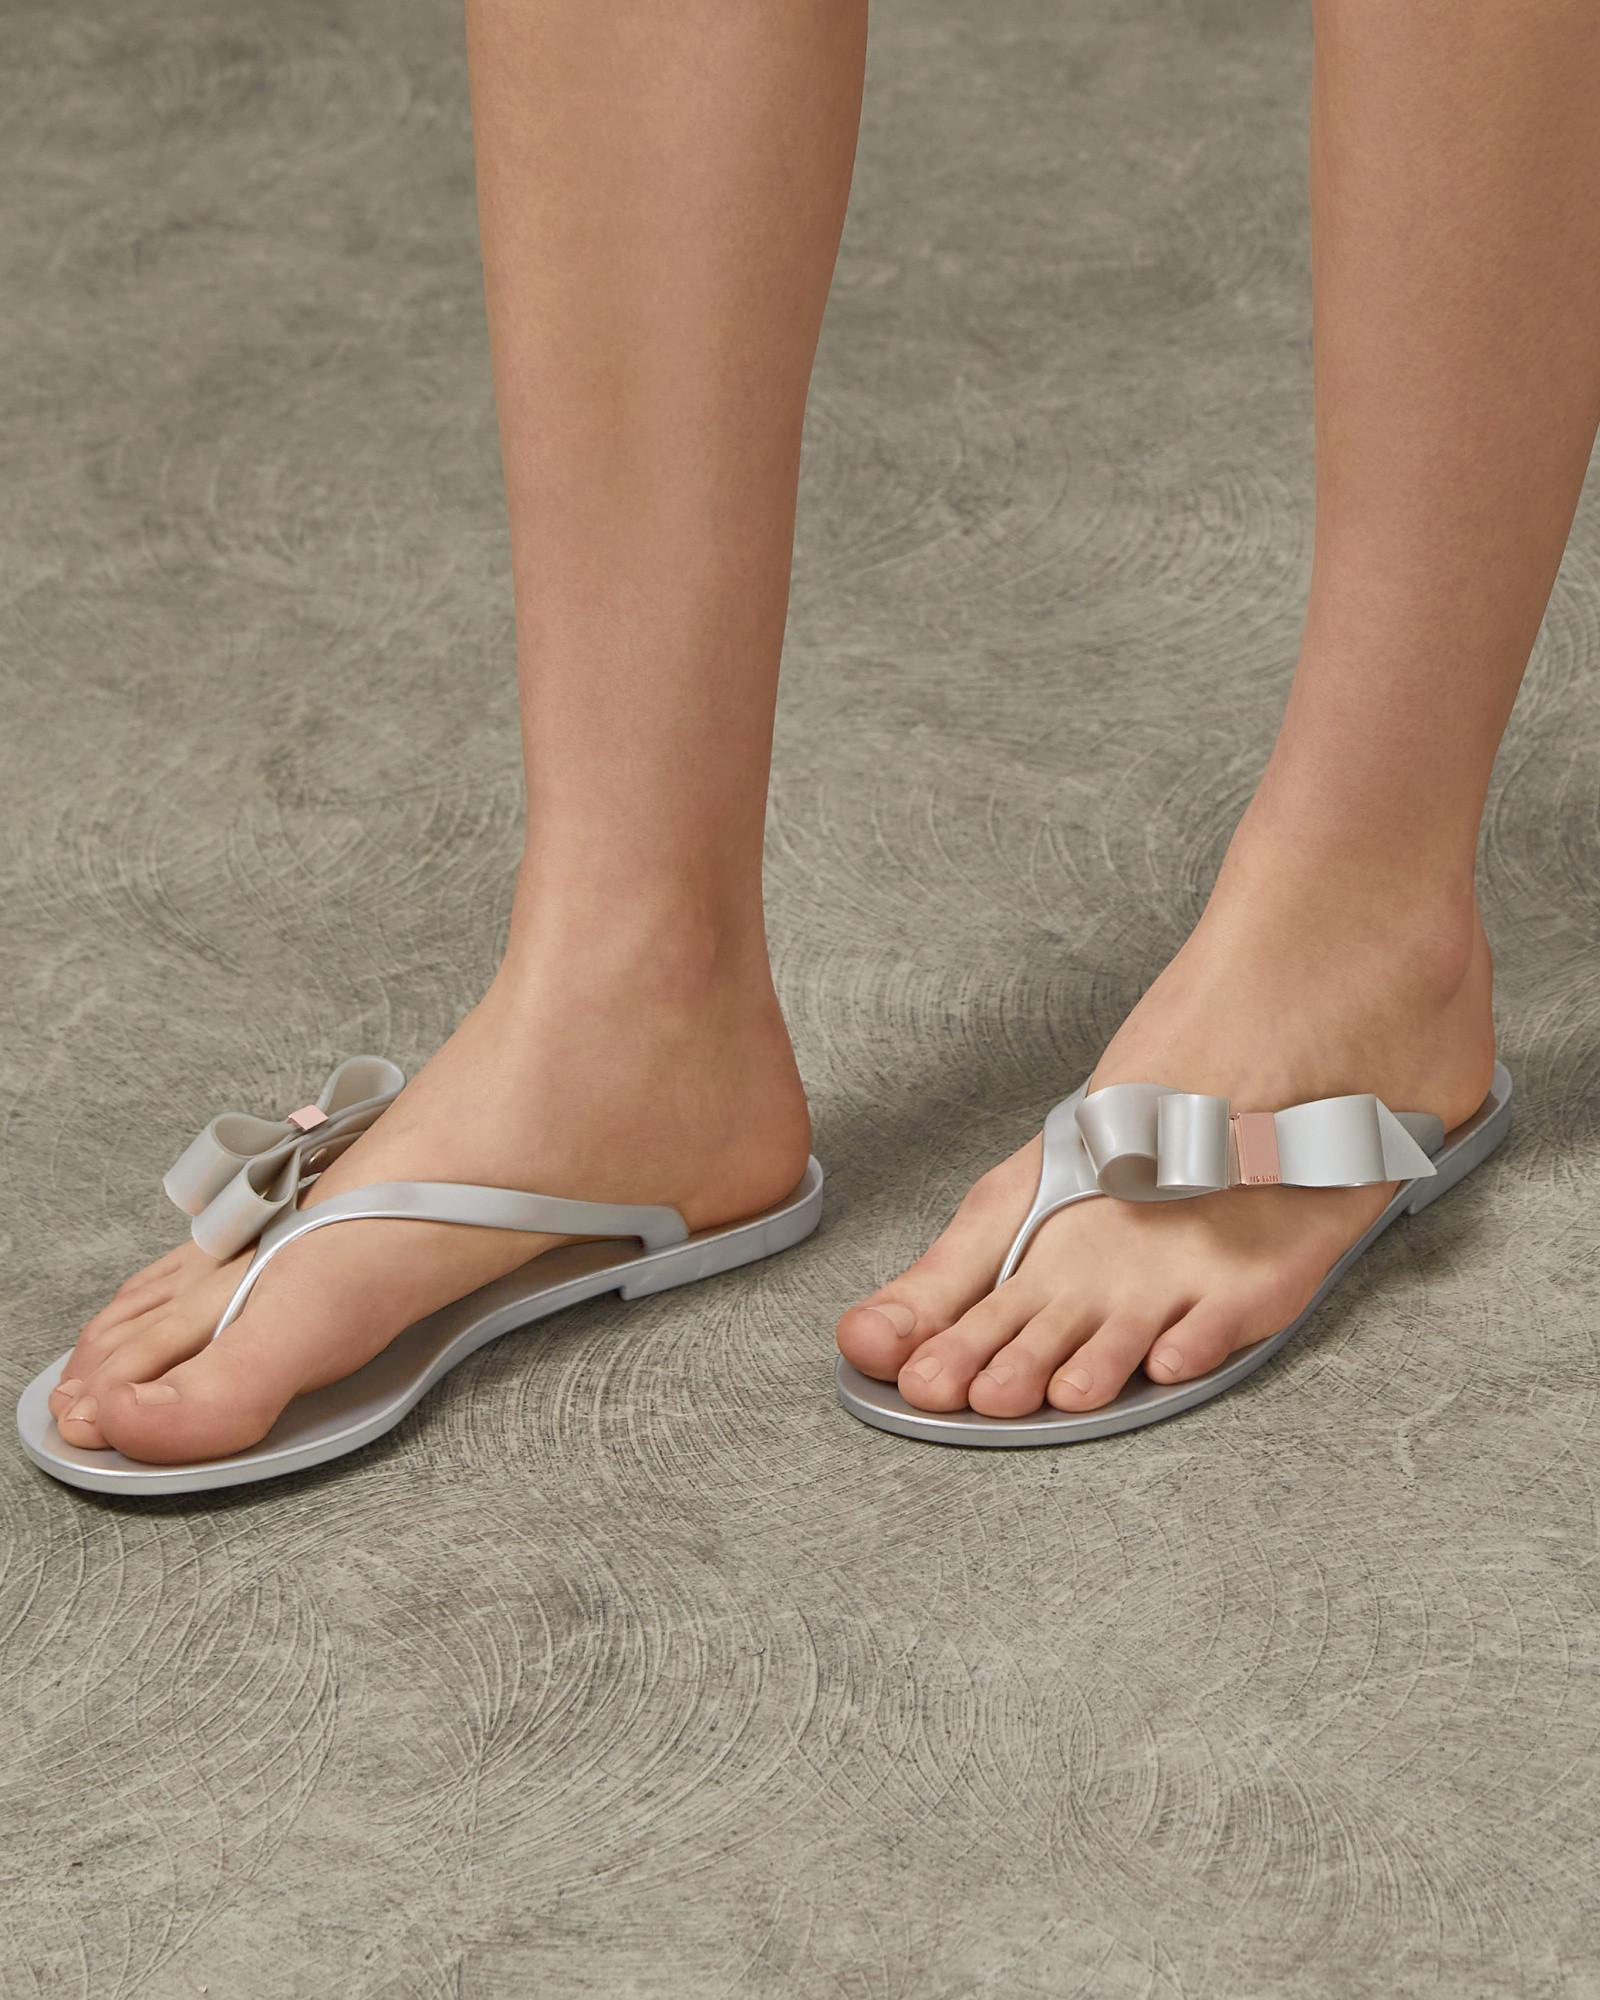 5c889eea8 Ted Baker Bow Detail Jelly Flip Flops in Metallic - Save 10% - Lyst